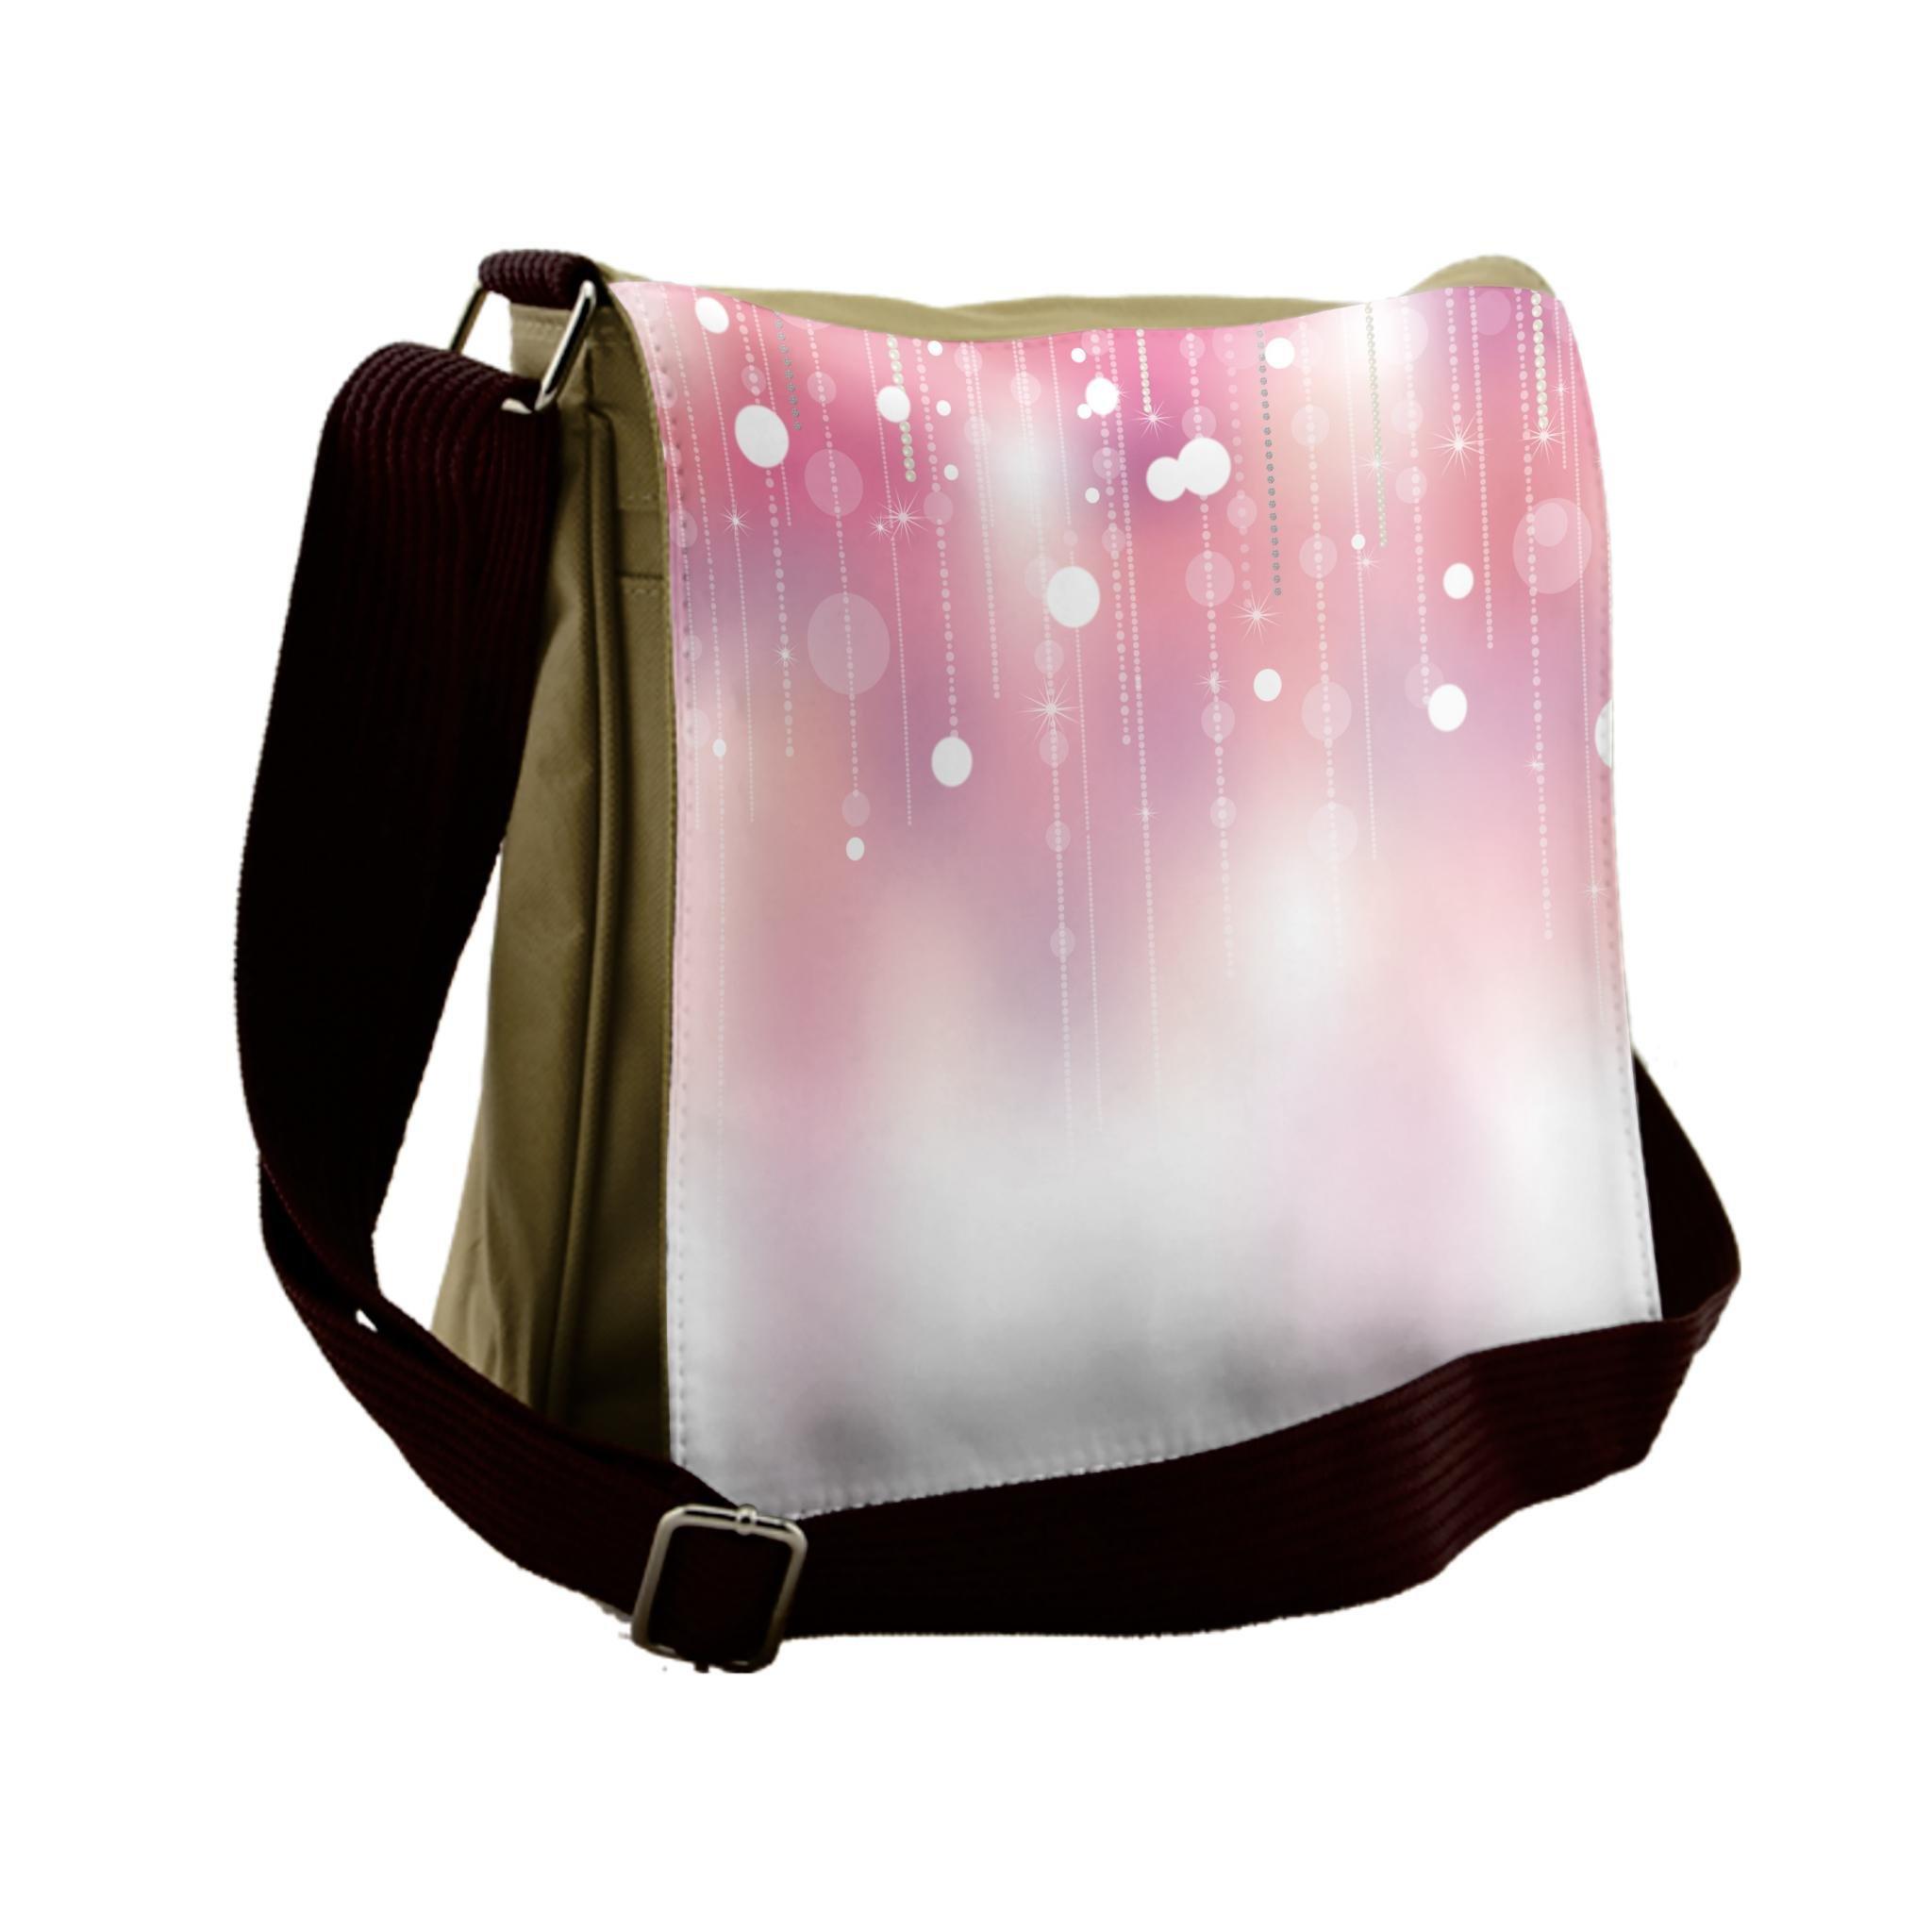 Lunarable Pearls Messenger Bag, Bridal Wedding Theme Artsy, Unisex Cross-body